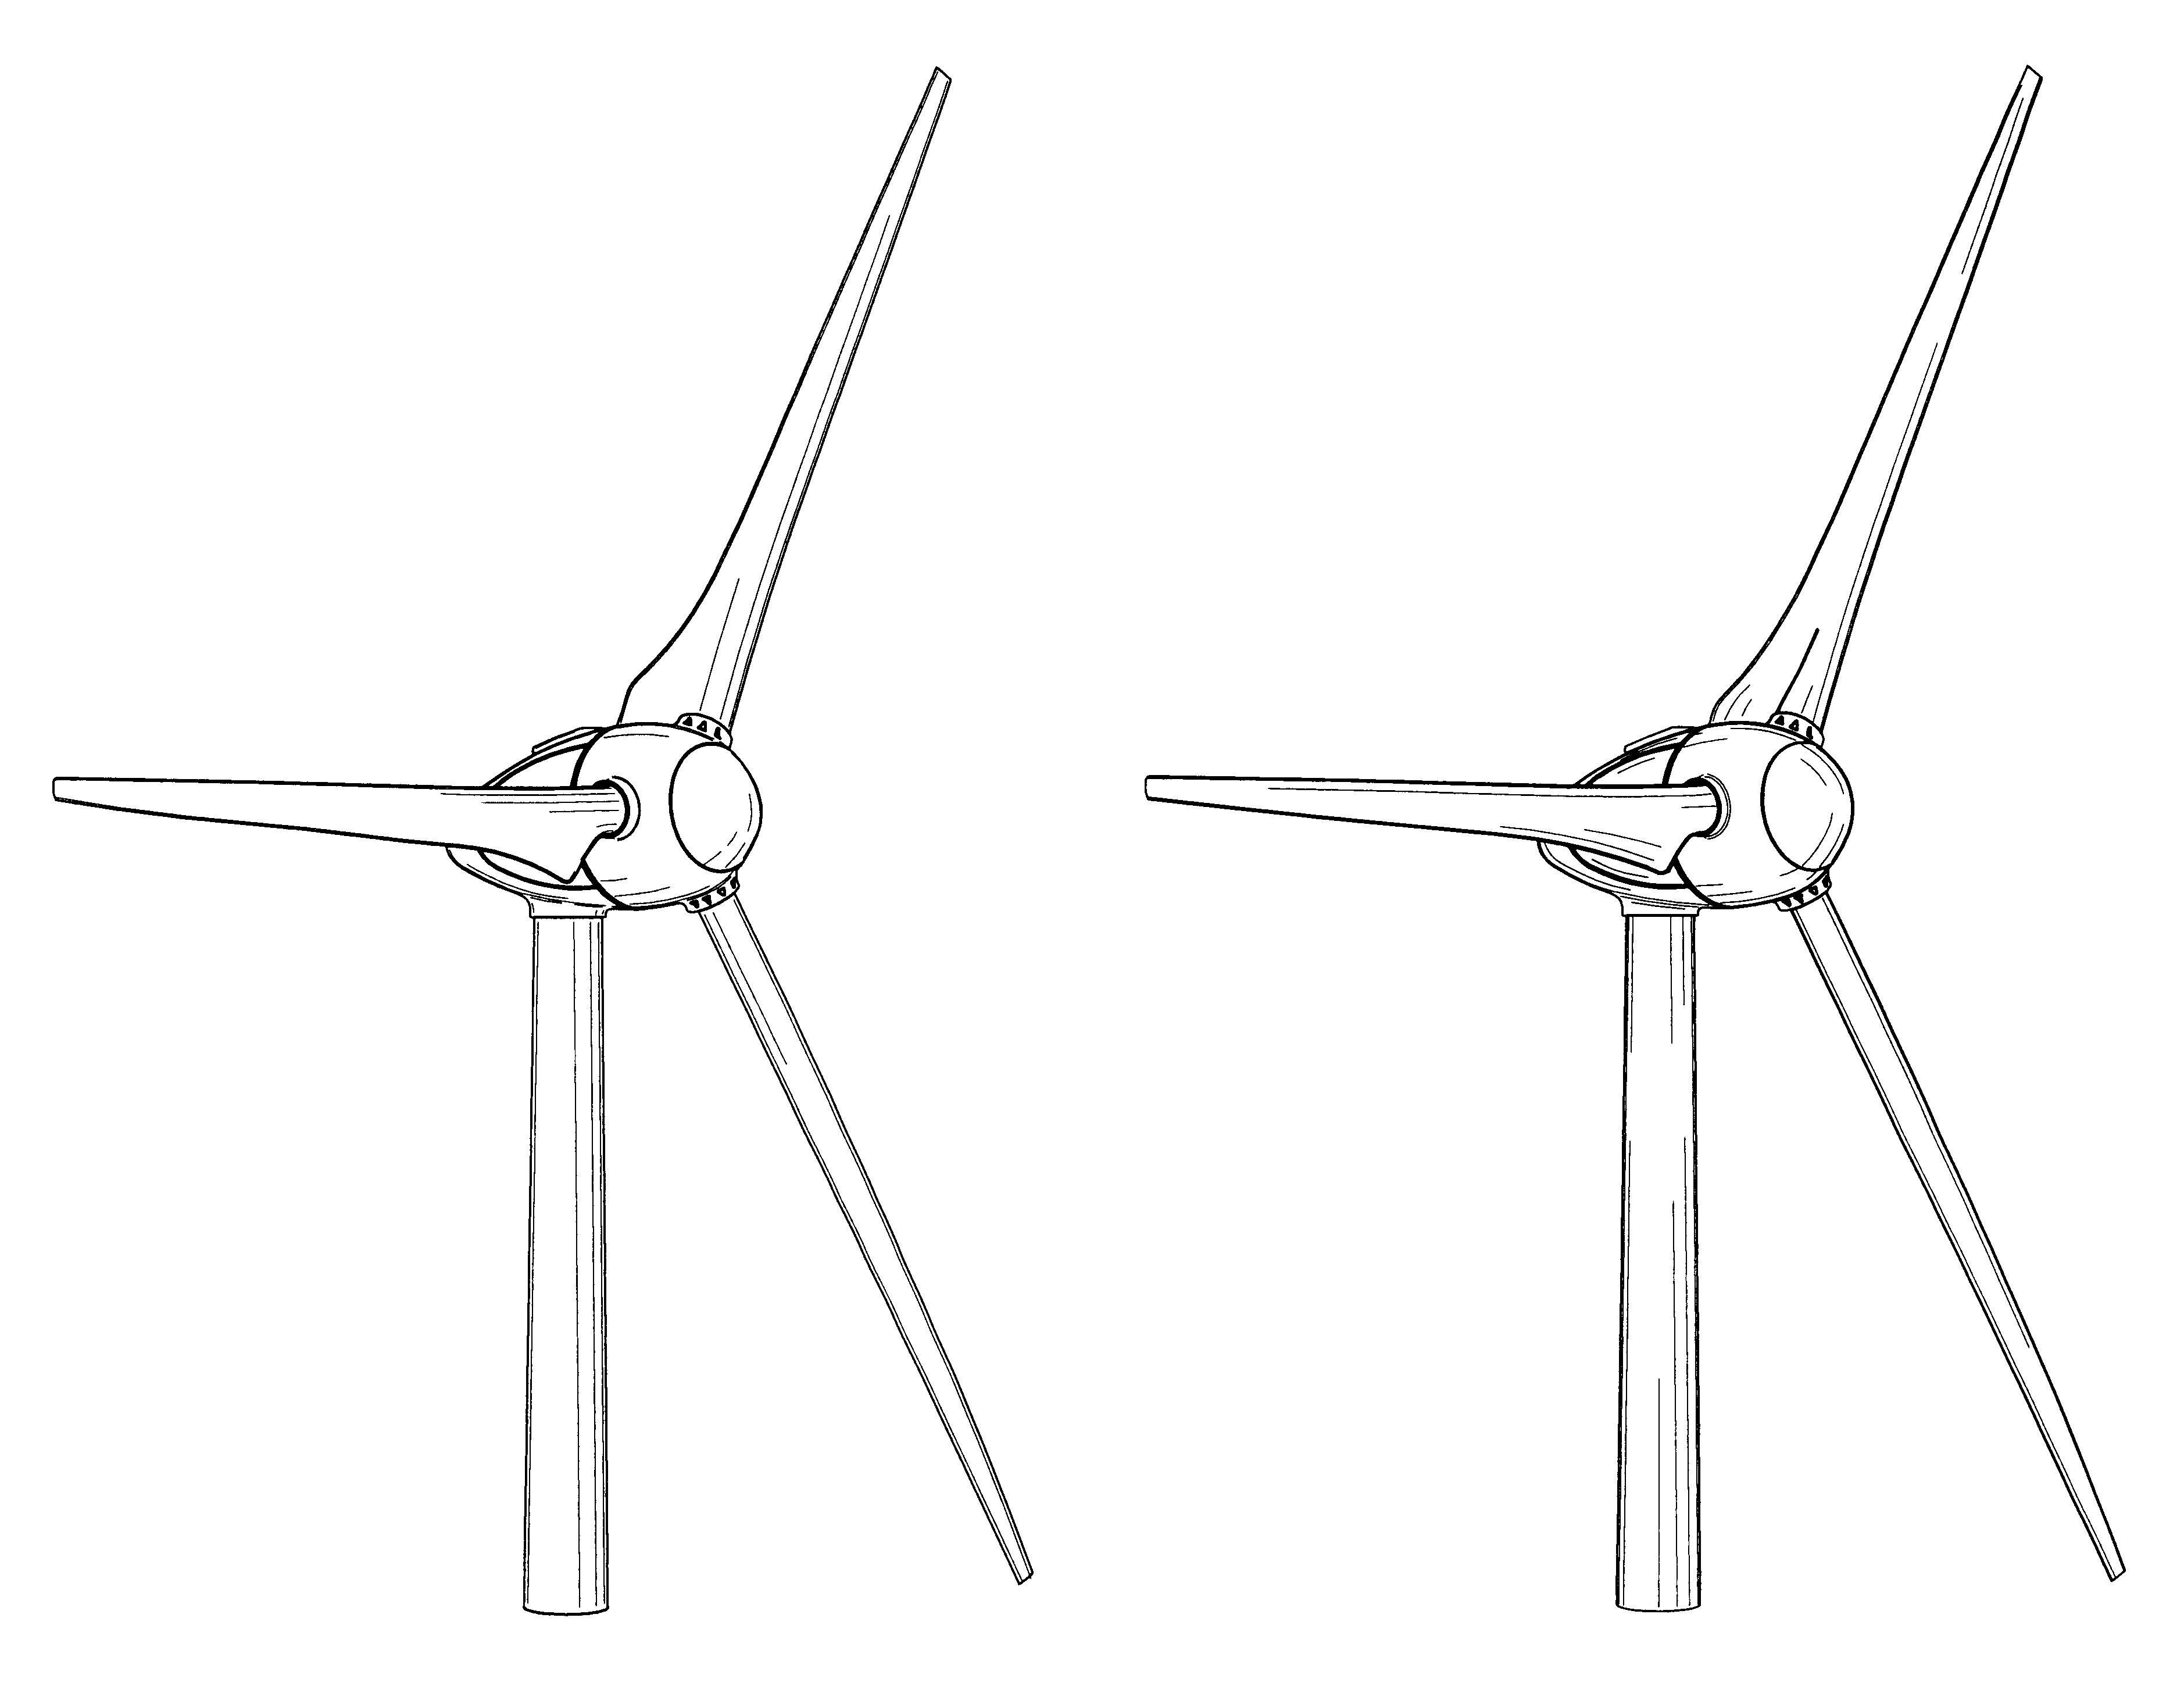 patent usd517986 - wind turbine and rotor blade of a wind turbine